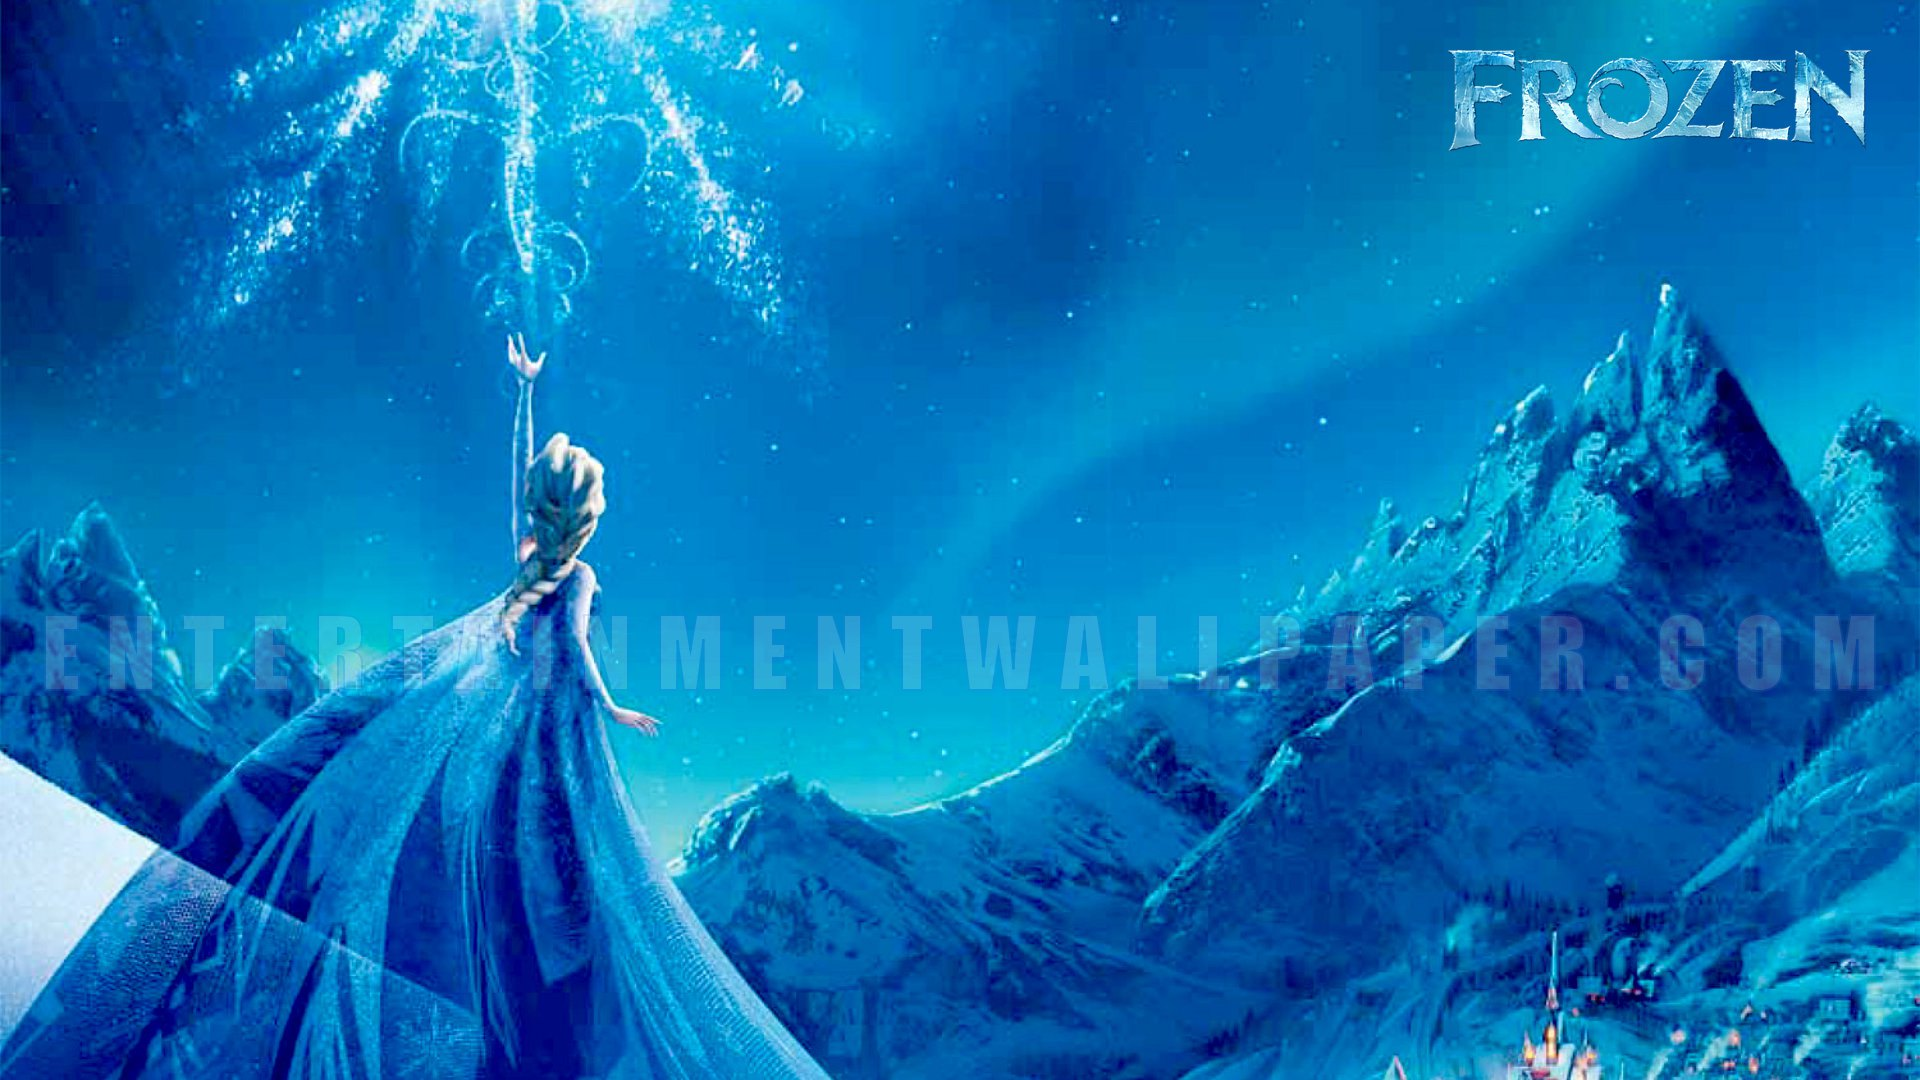 Frozen Elsa Wallpaper 1920x1080